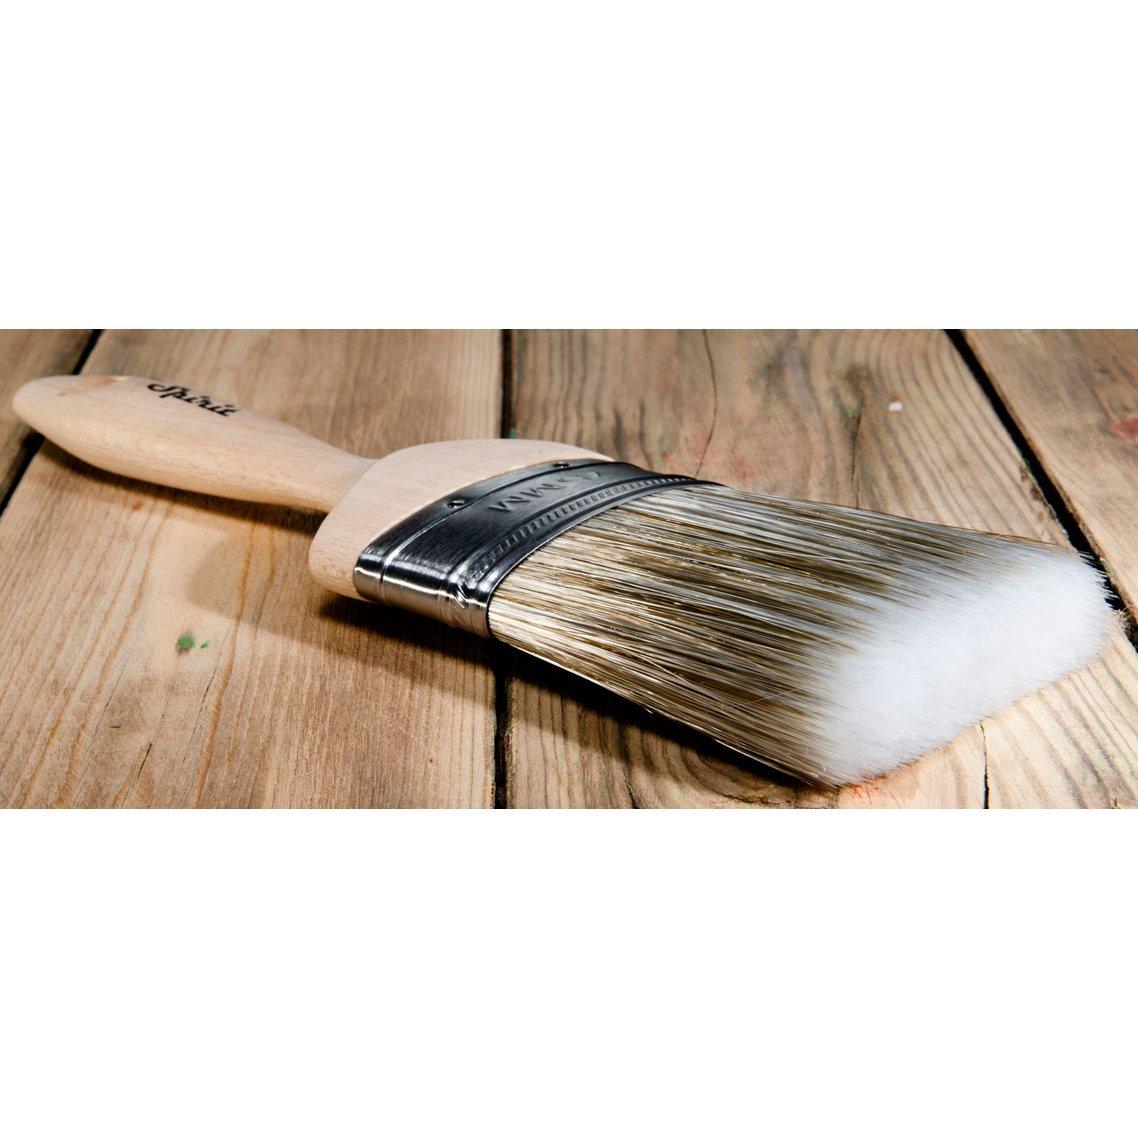 1-1//2 Inch, 2 Inch, 3 Inch Pioneer Spirit Oval Technofil 3 Piece Paint Brush Set